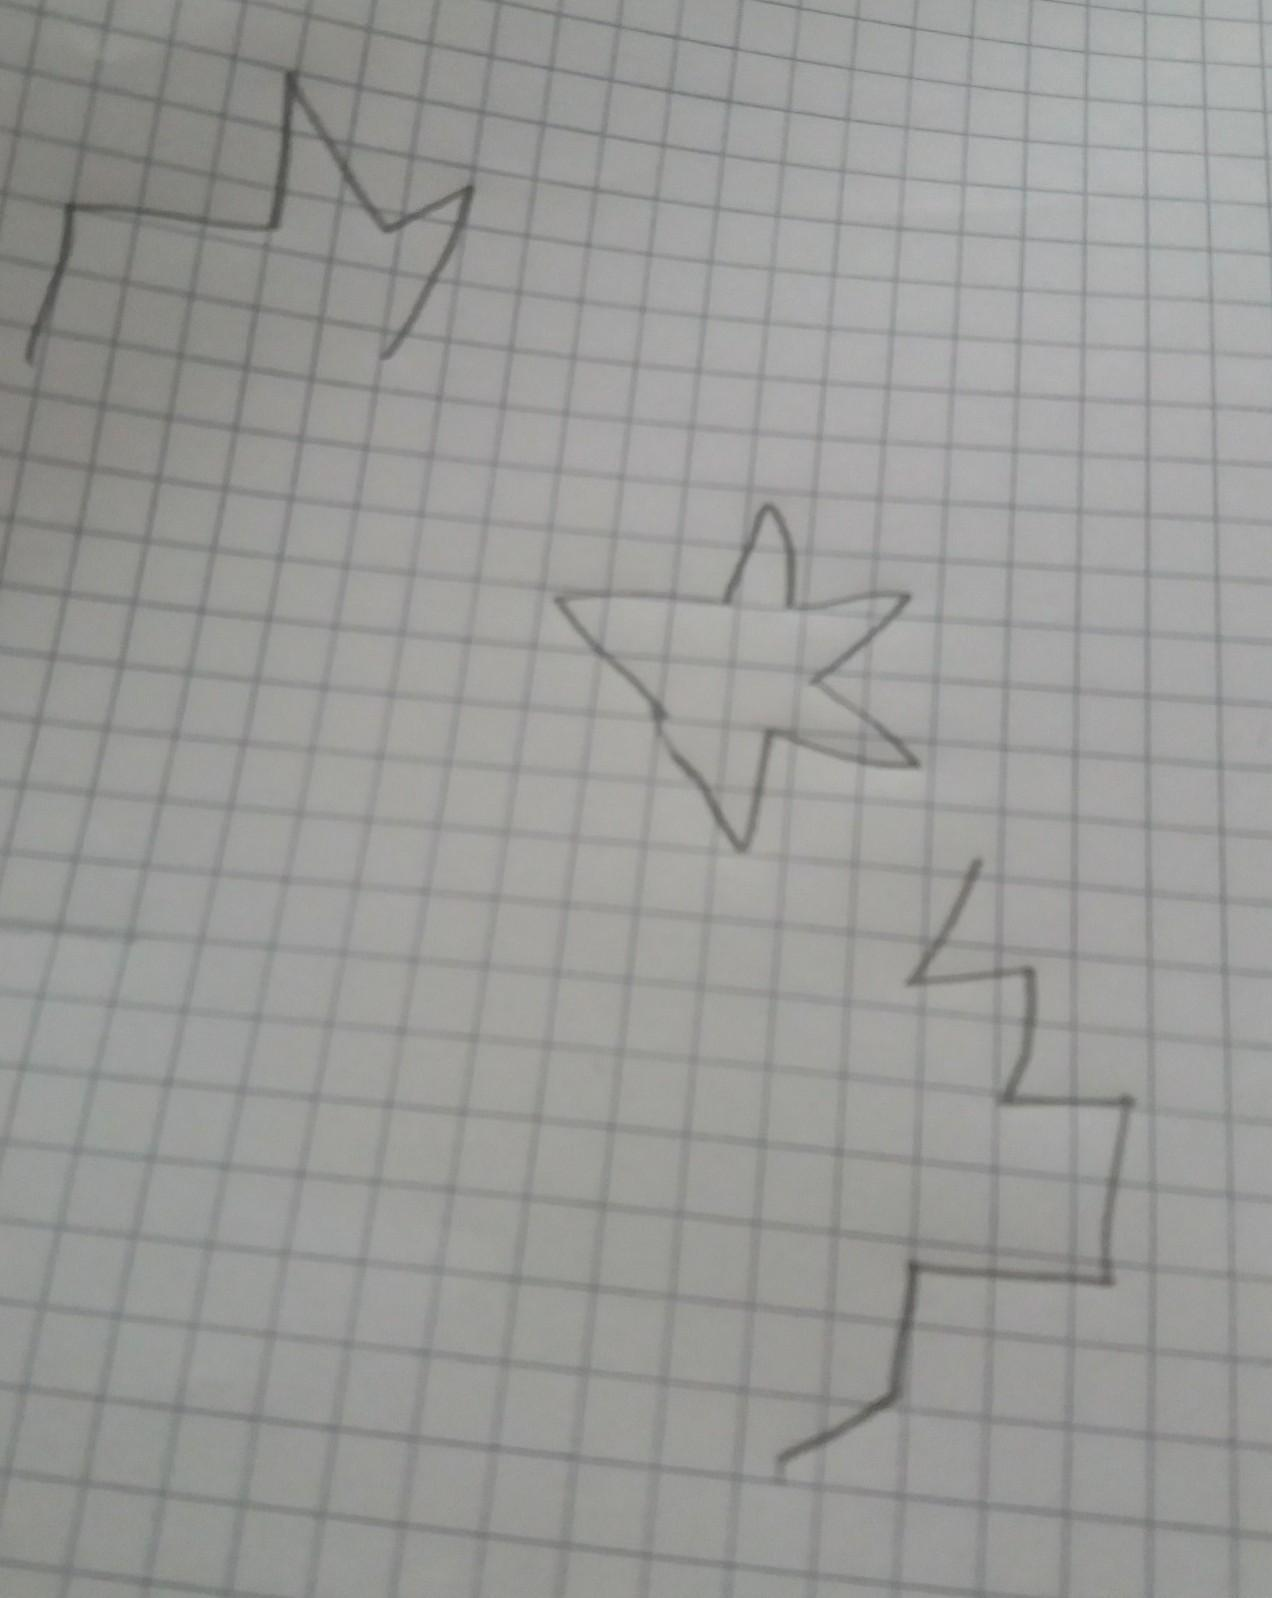 construiți un grafic cu o linie de tendință